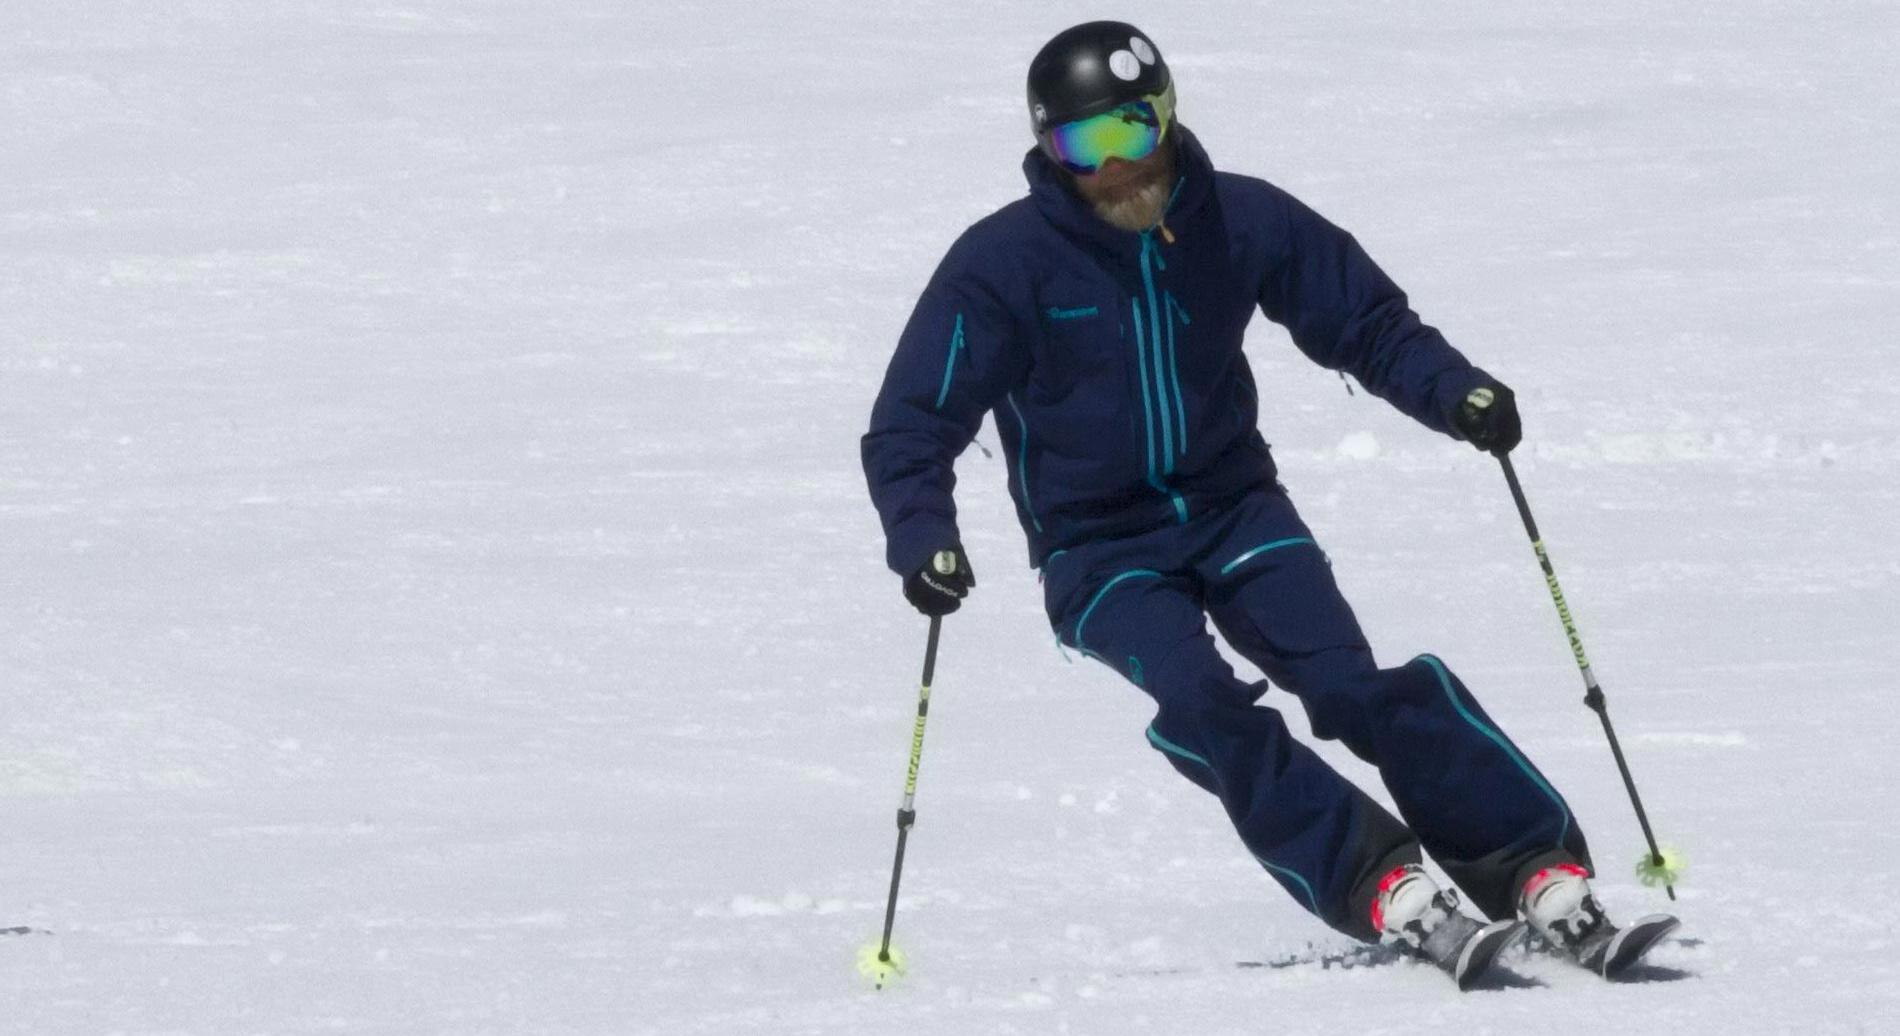 Fun&Snow Skiinstructor Advanced